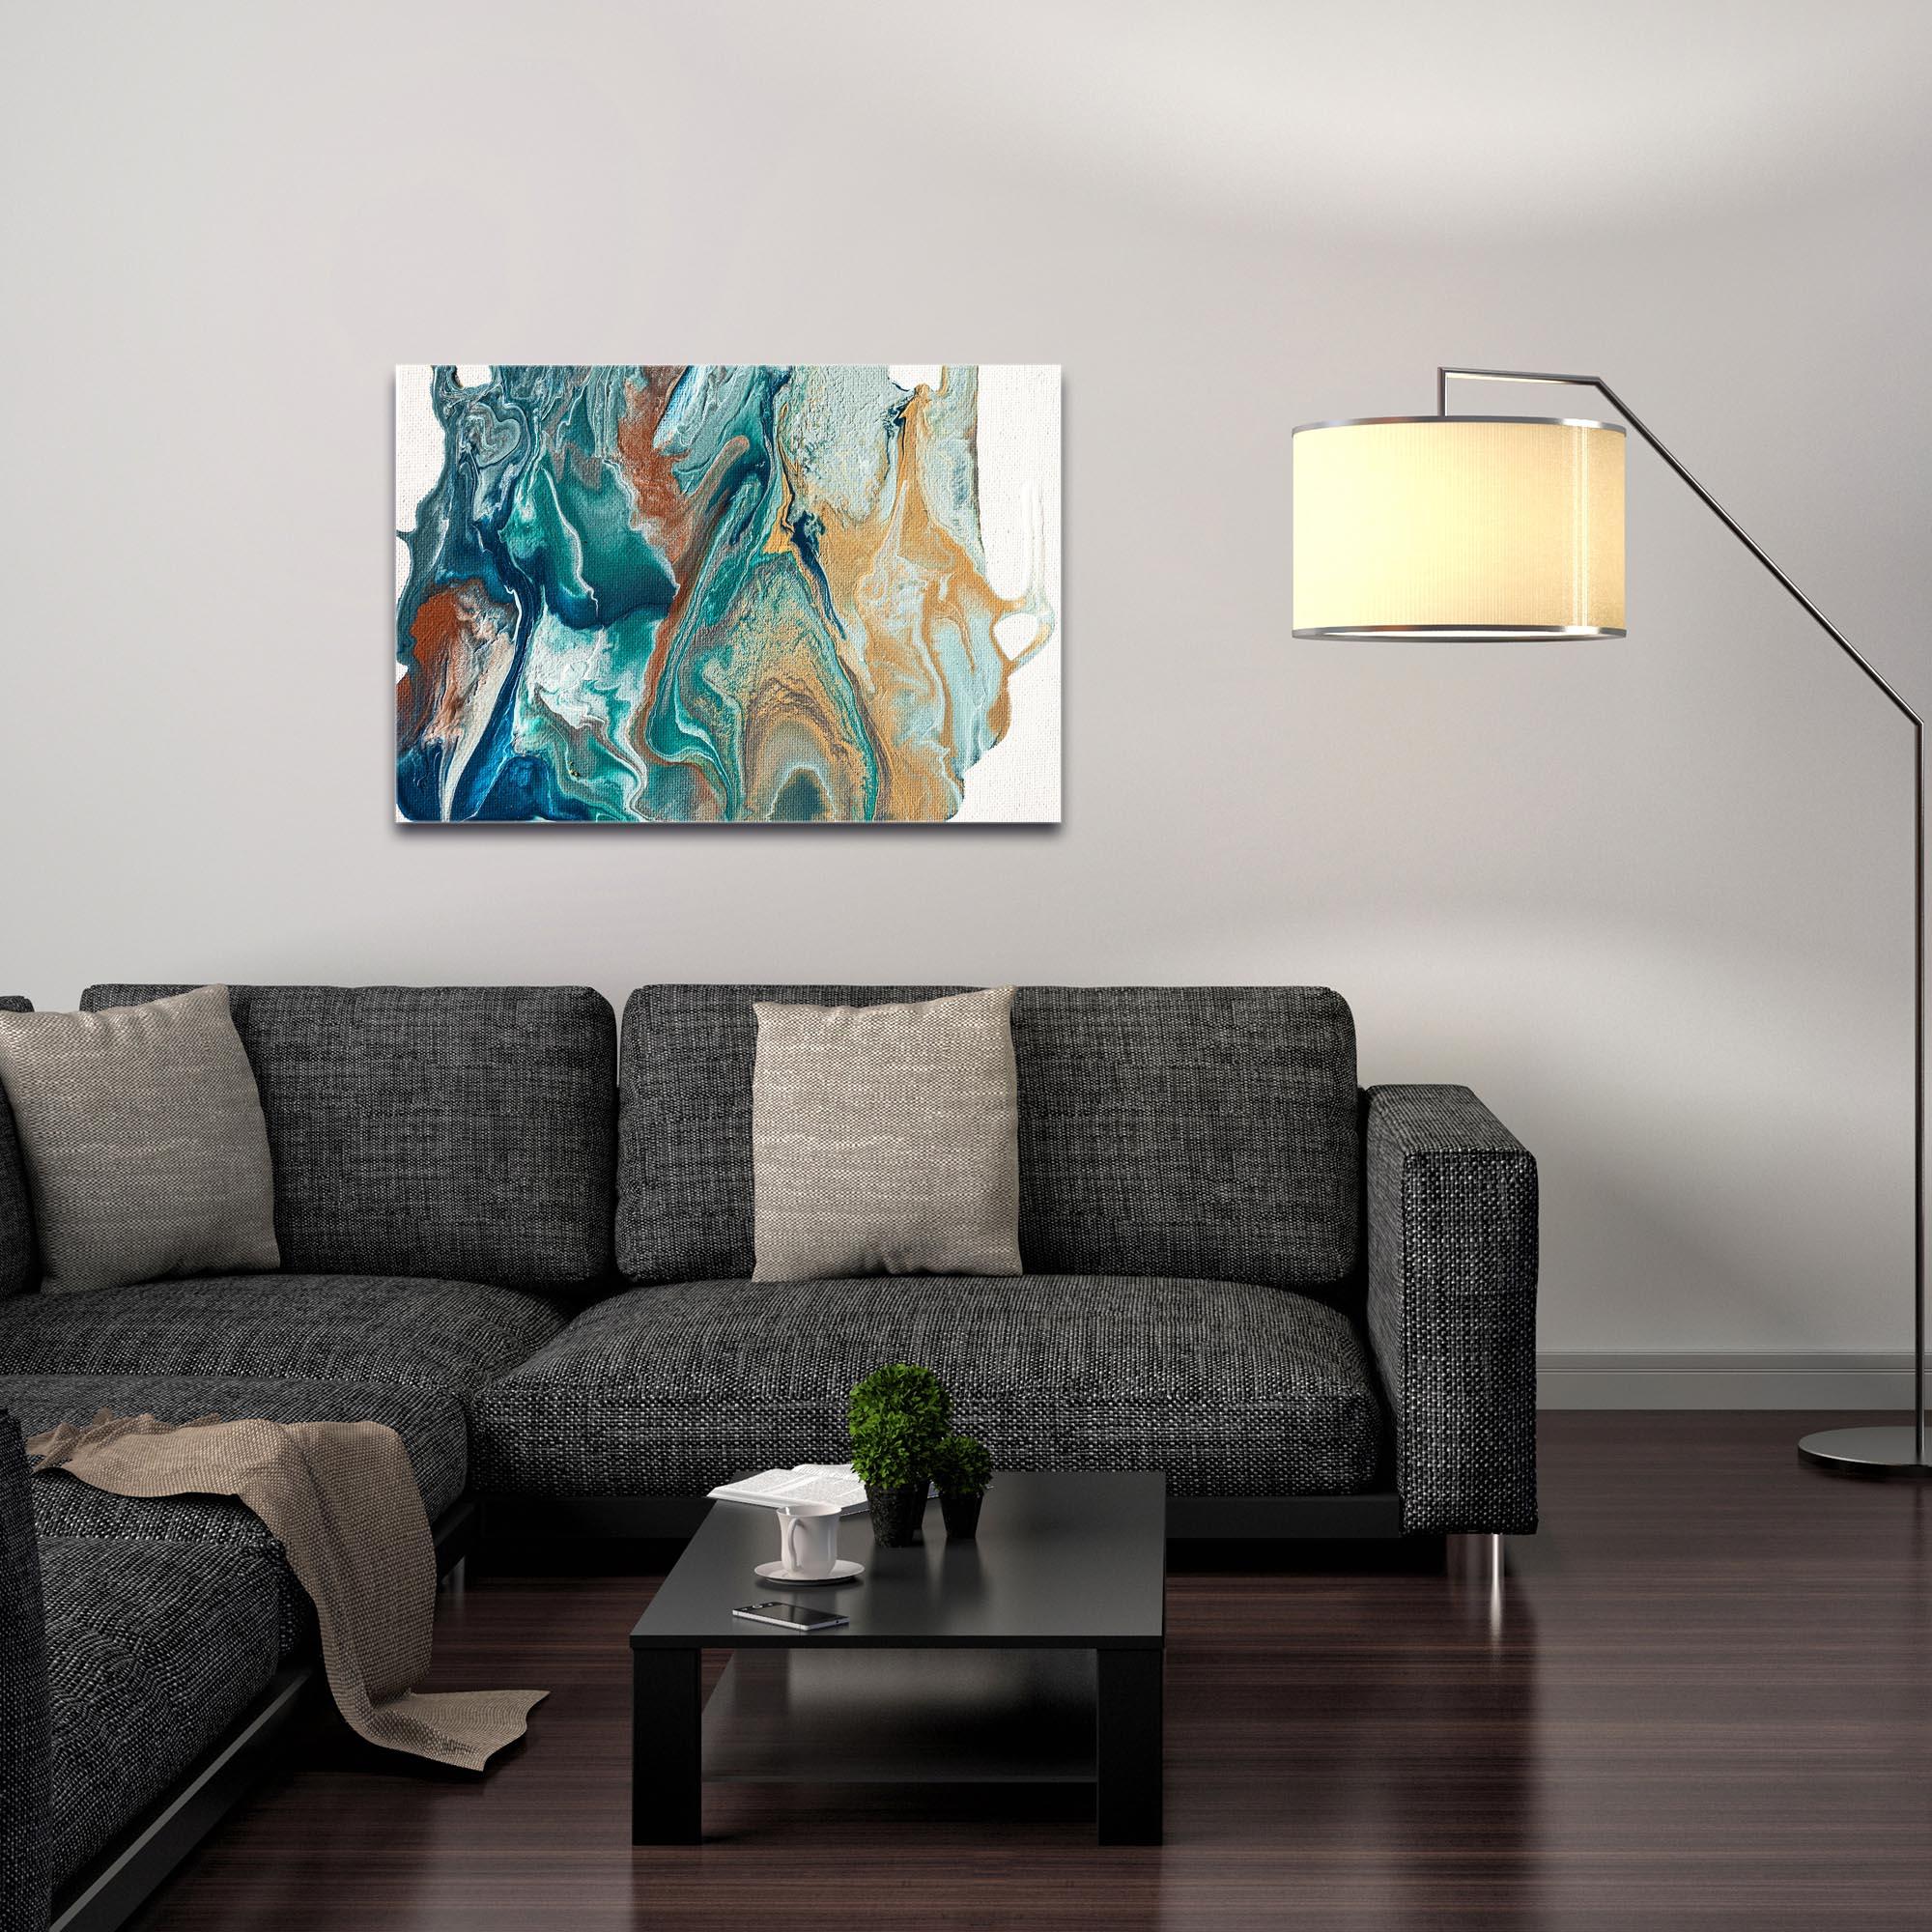 Abstract Wall Art 'Earth 2' - Urban Splatter Decor on Metal or Plexiglass - Image 3